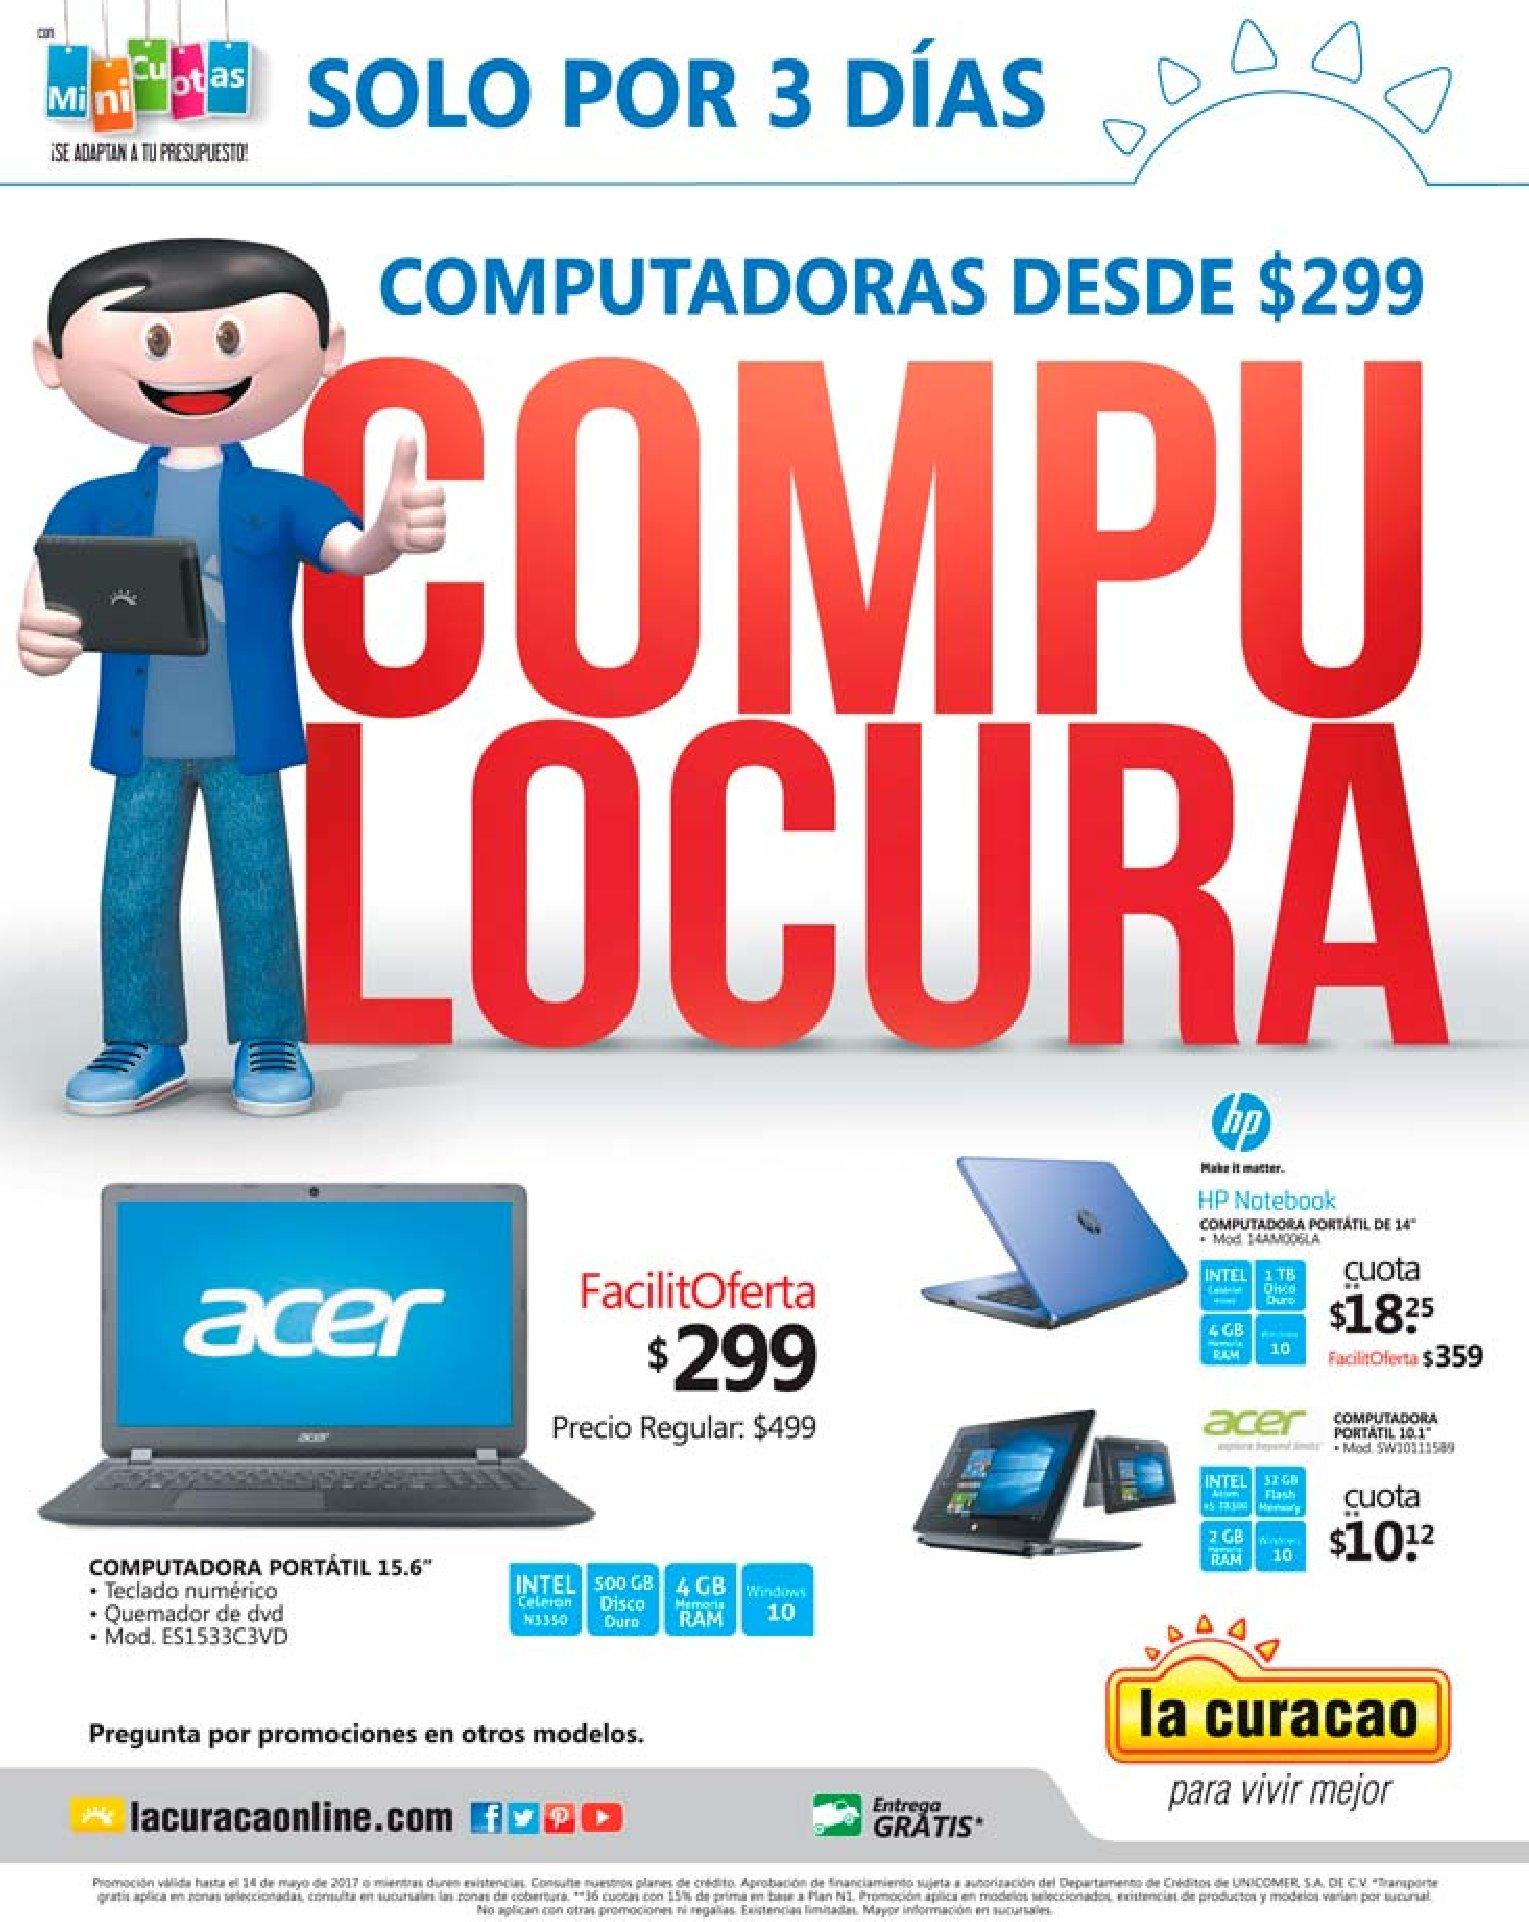 COMPU LOCURA ofertas en computadoras laptps y prtatiles